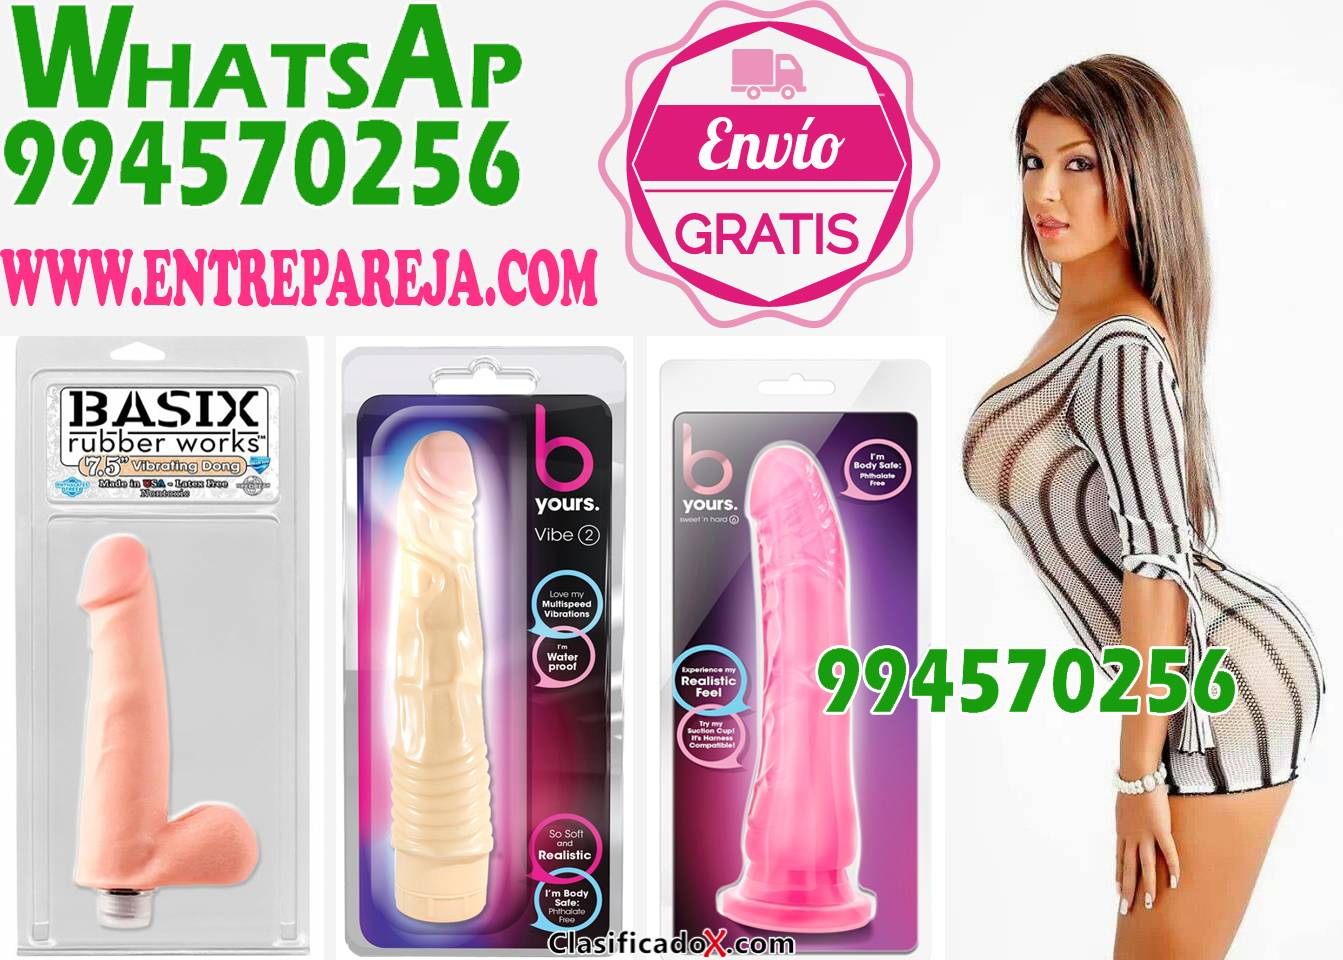 JUGUETES AREQUIPA CAIMA SEXSHOP 994570256